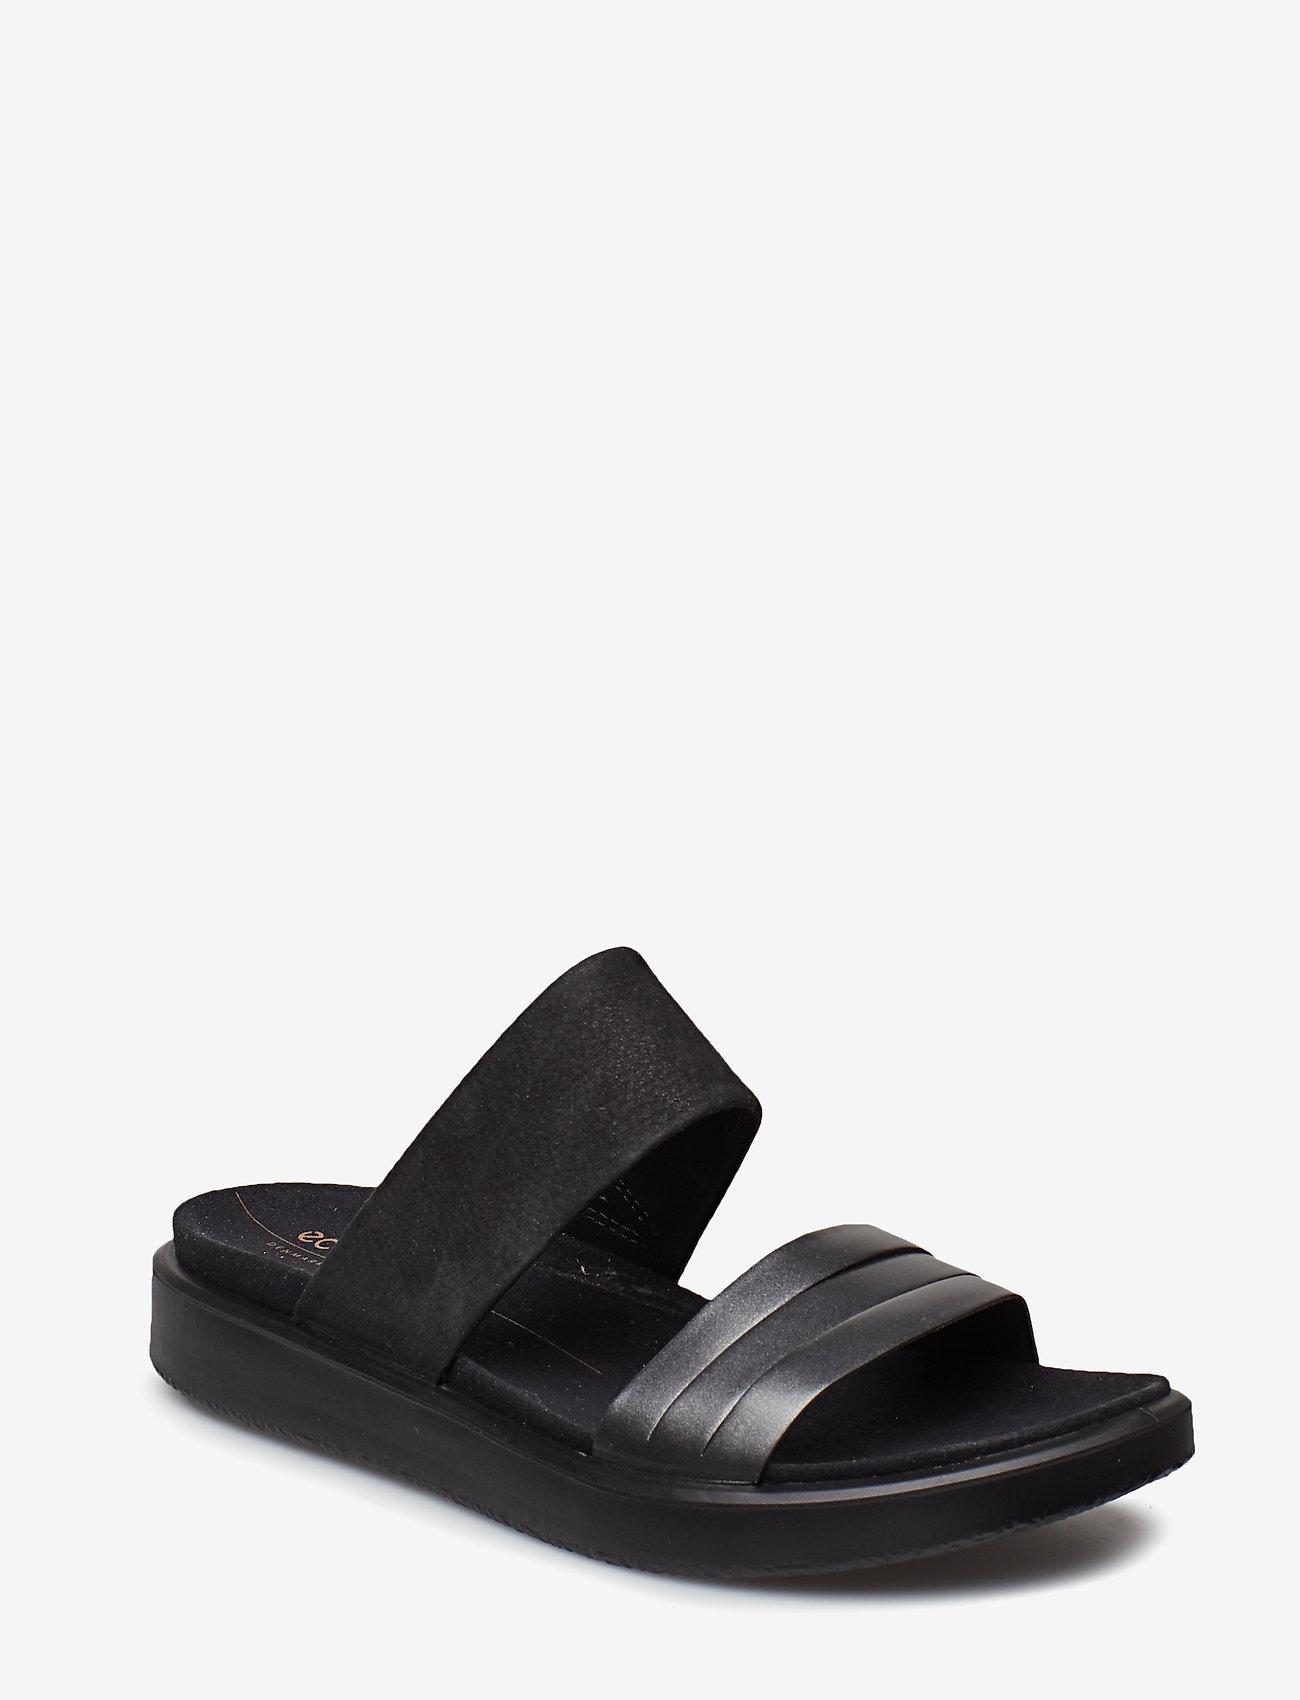 ECCO - FLOWT W - flat sandals - black dark shadow metallic/black - 0